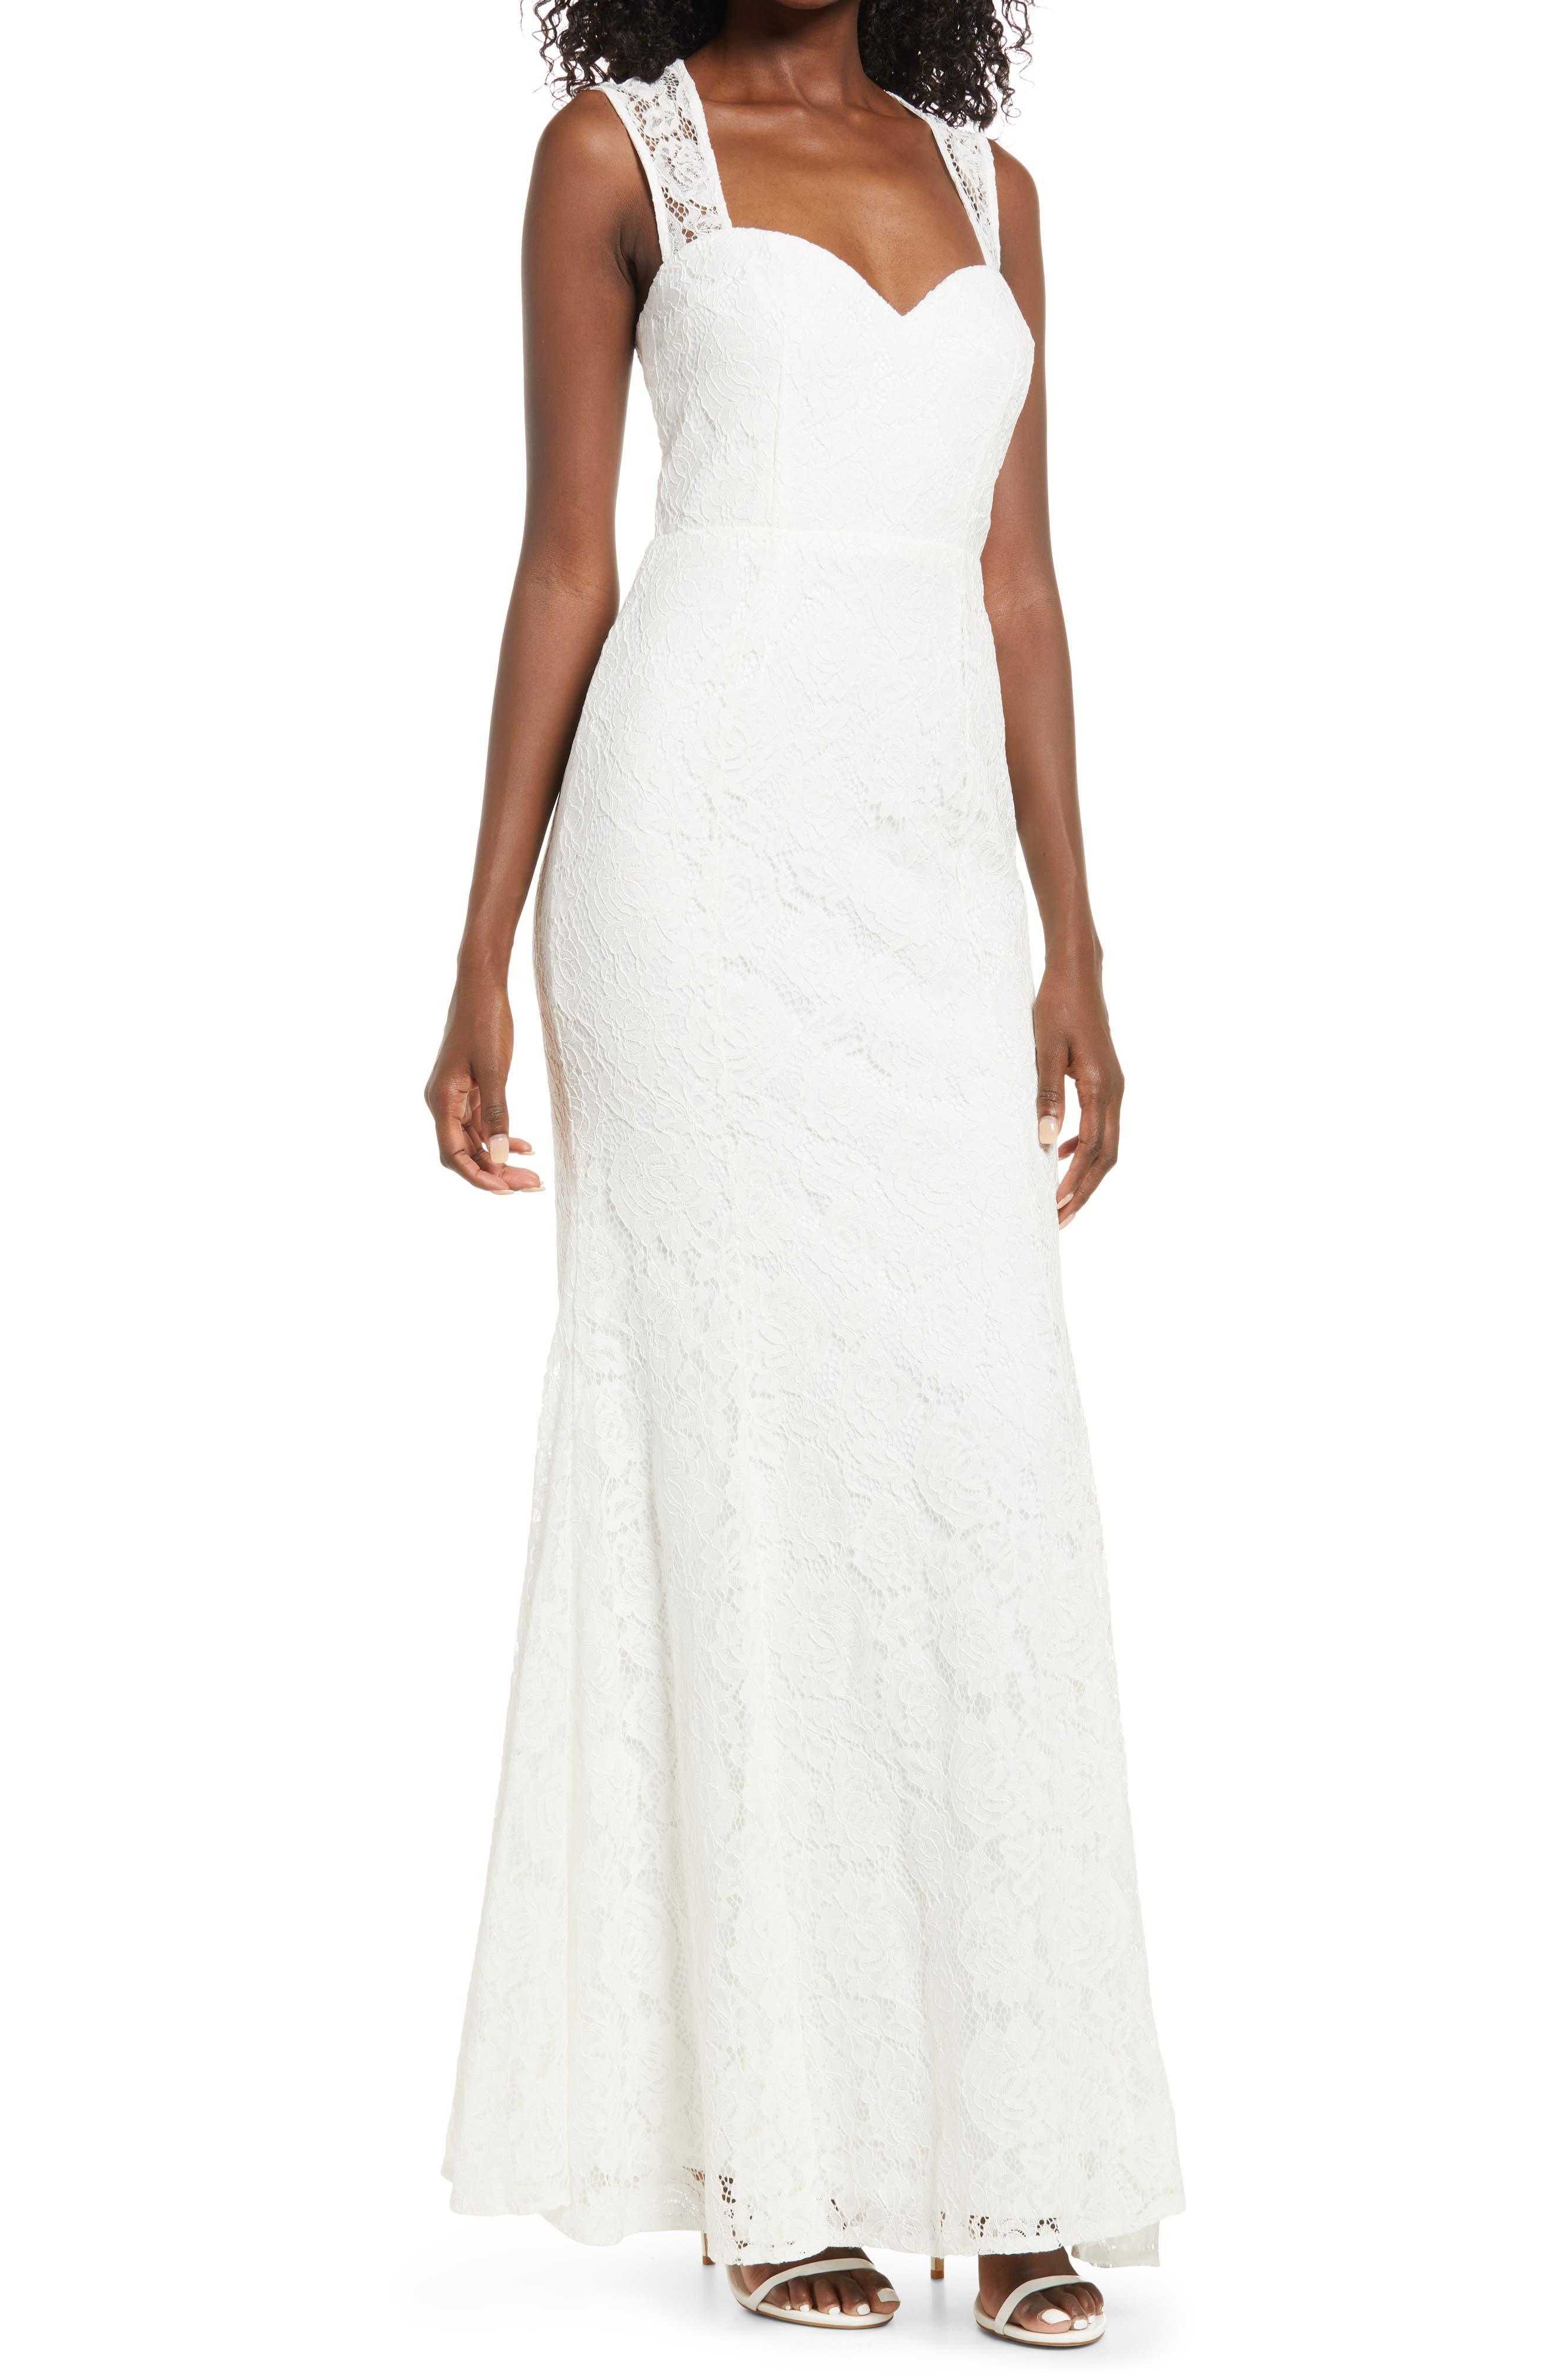 1930s Style Wedding Dresses   Art Deco Wedding Dress Womens Lulus Rosetta Lace Gown Size Small - White $108.00 AT vintagedancer.com